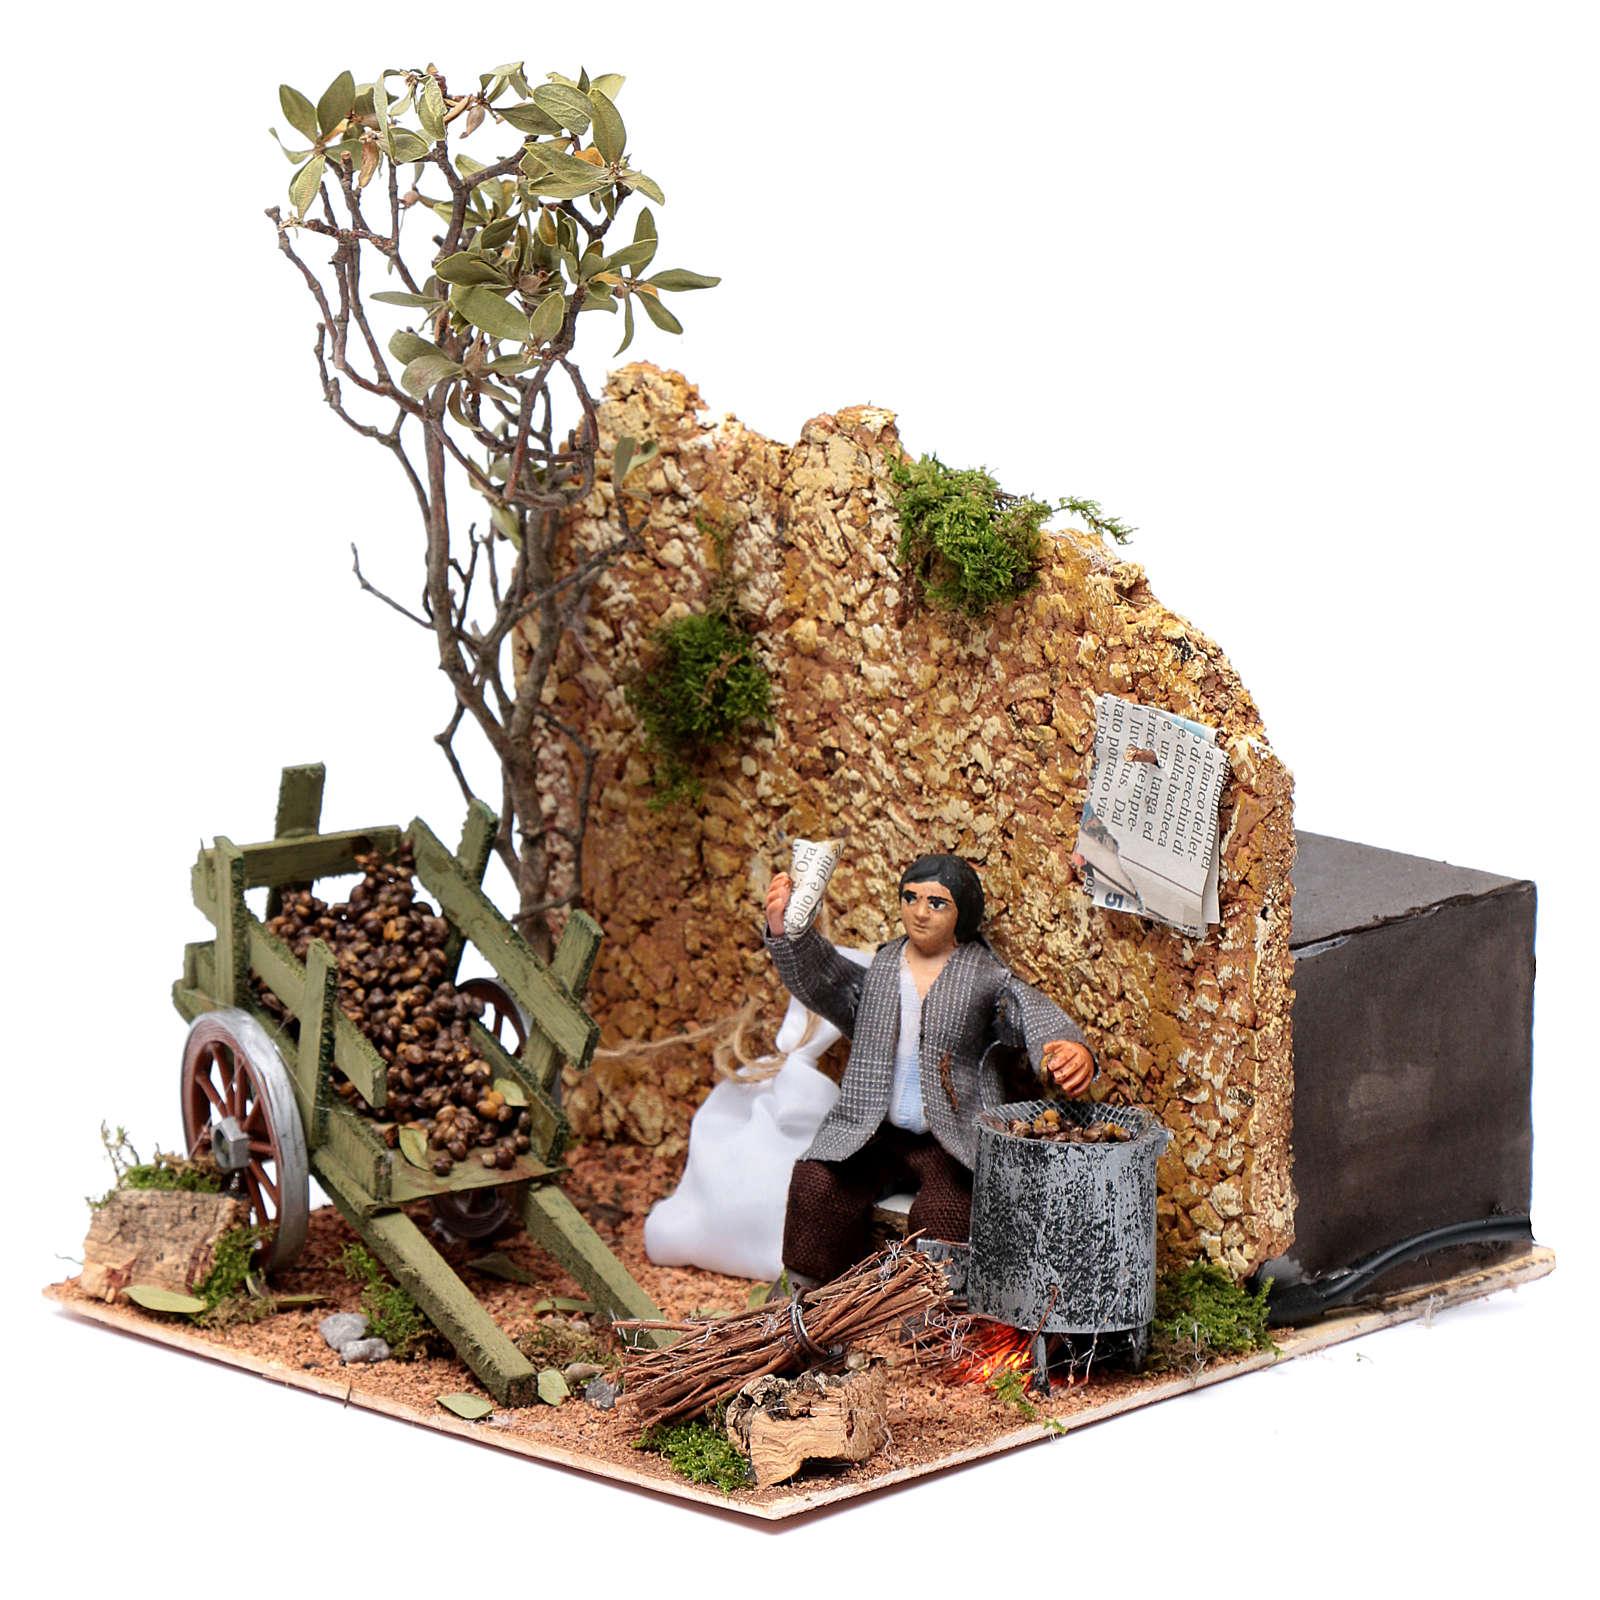 Neapolitan nativity scene statue chestnut seller 10 cm with movement 4